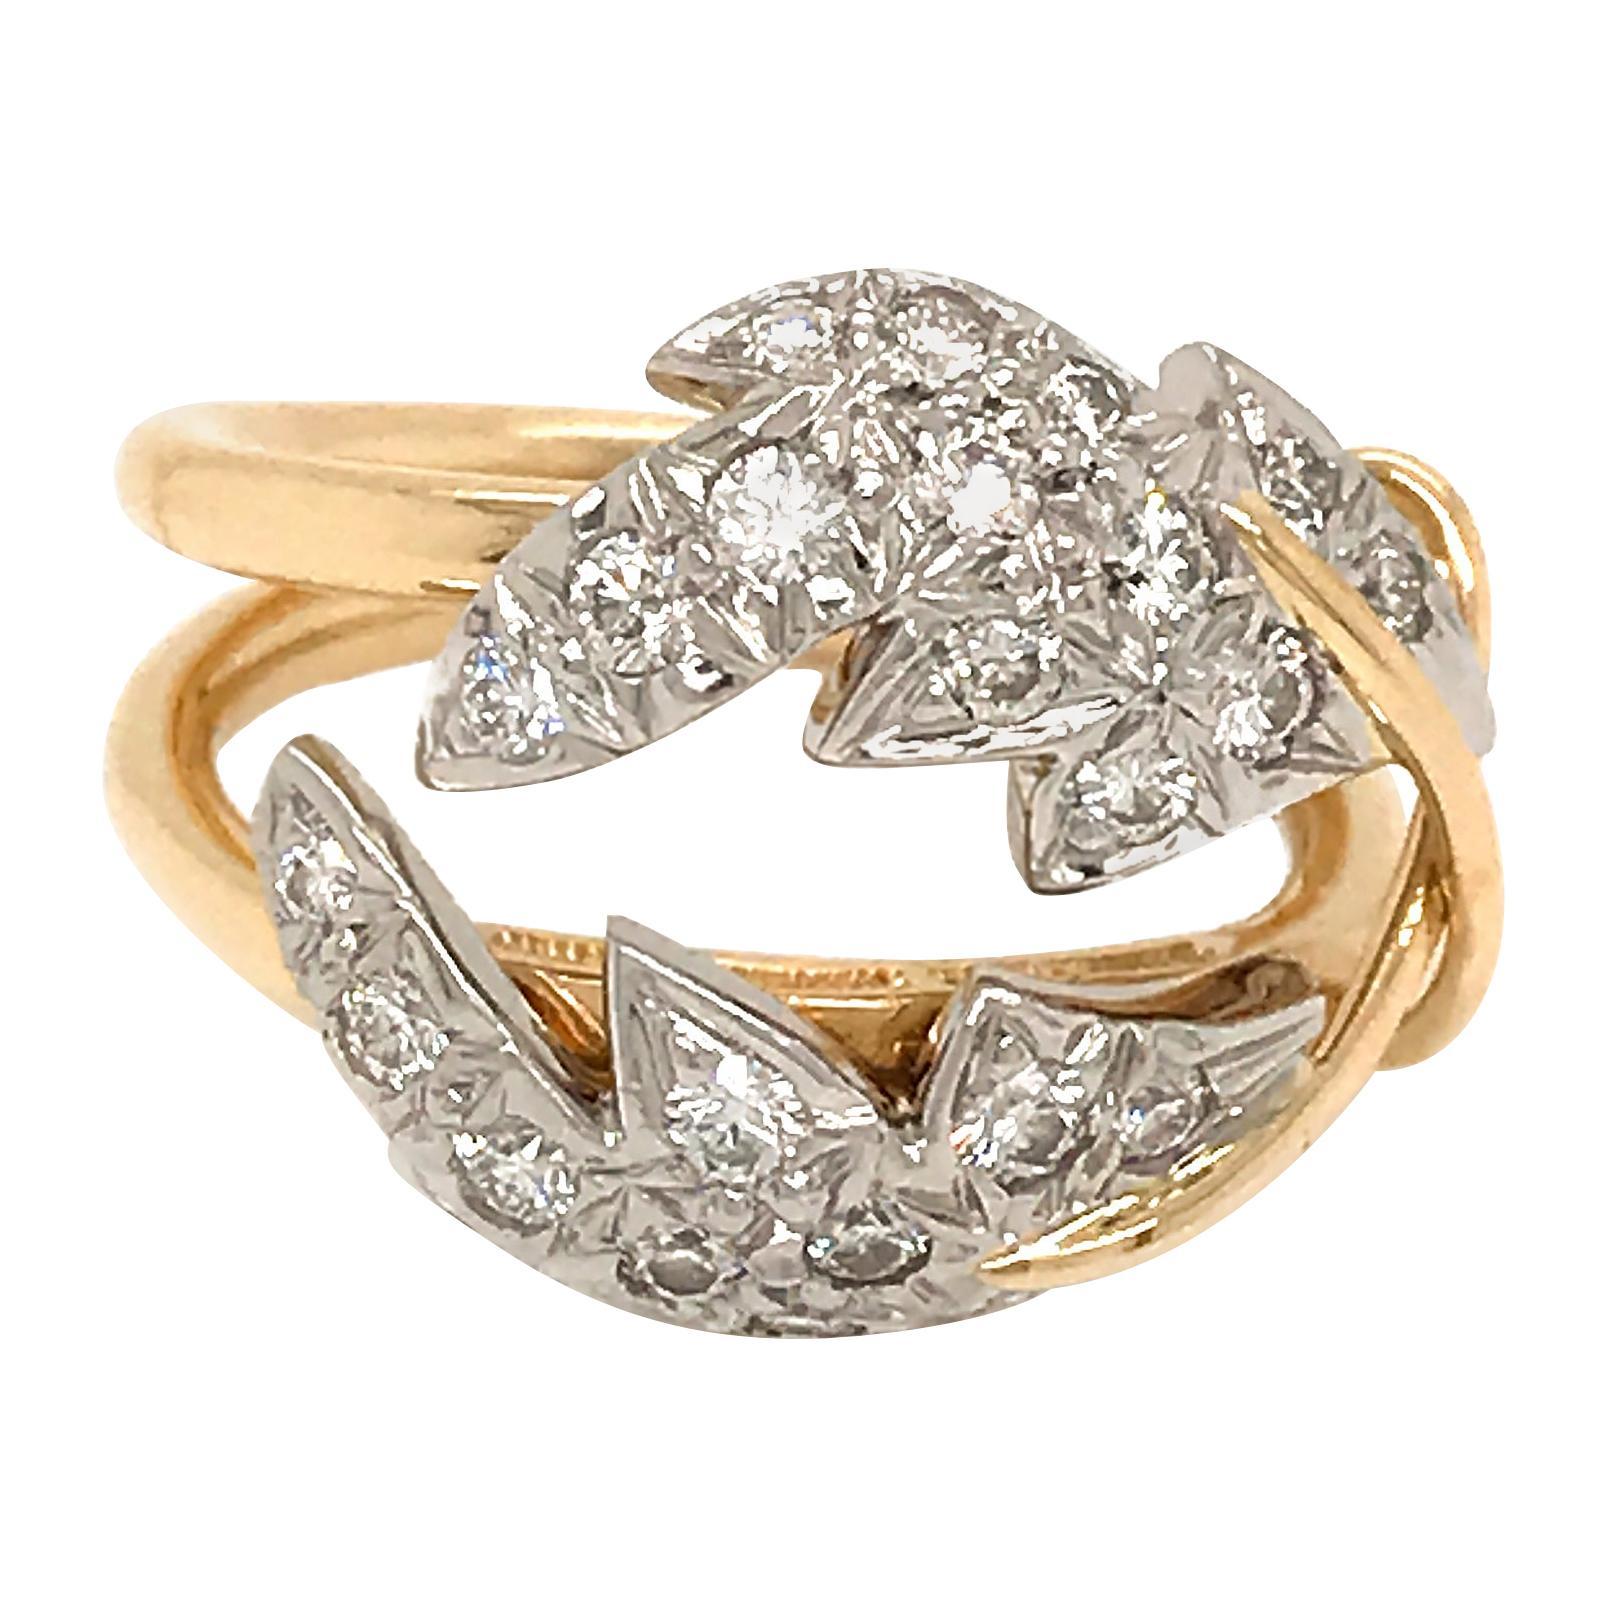 Tiffany & Co. Schlumberger 2-Leaf Diamond Ring